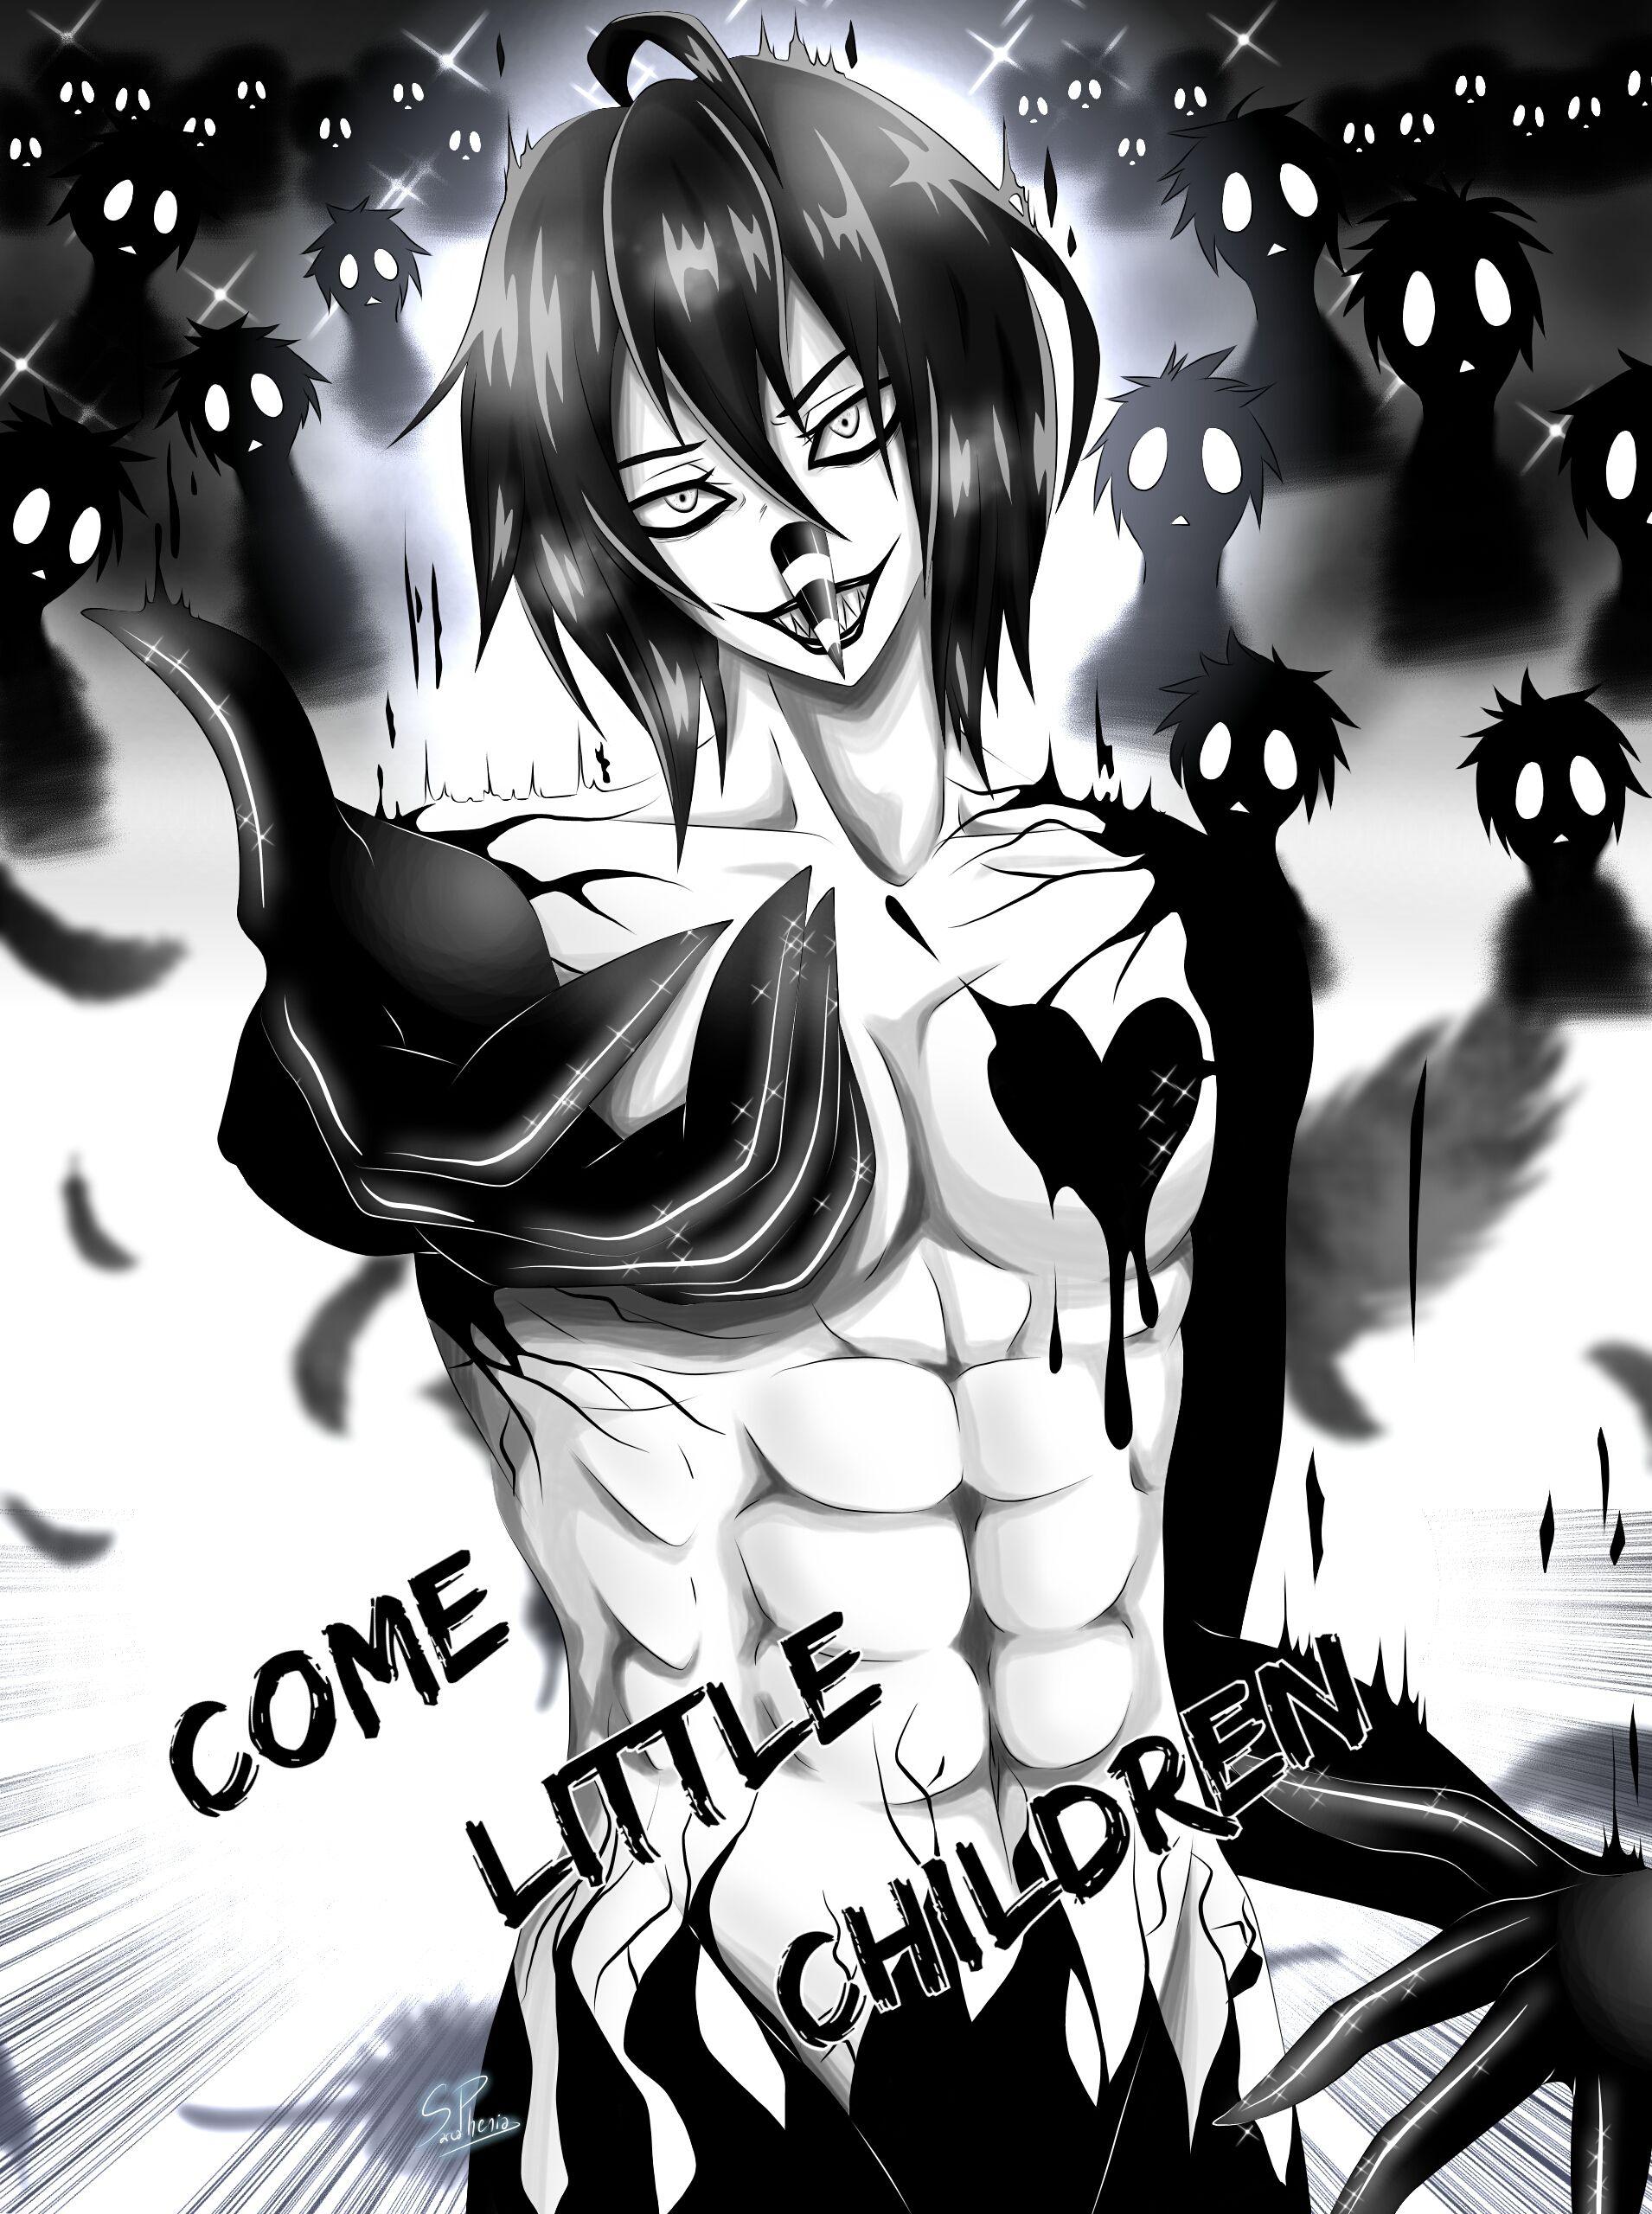 Épinglé par SarcaPhenia sur CREEPYPASTA Dessin manga